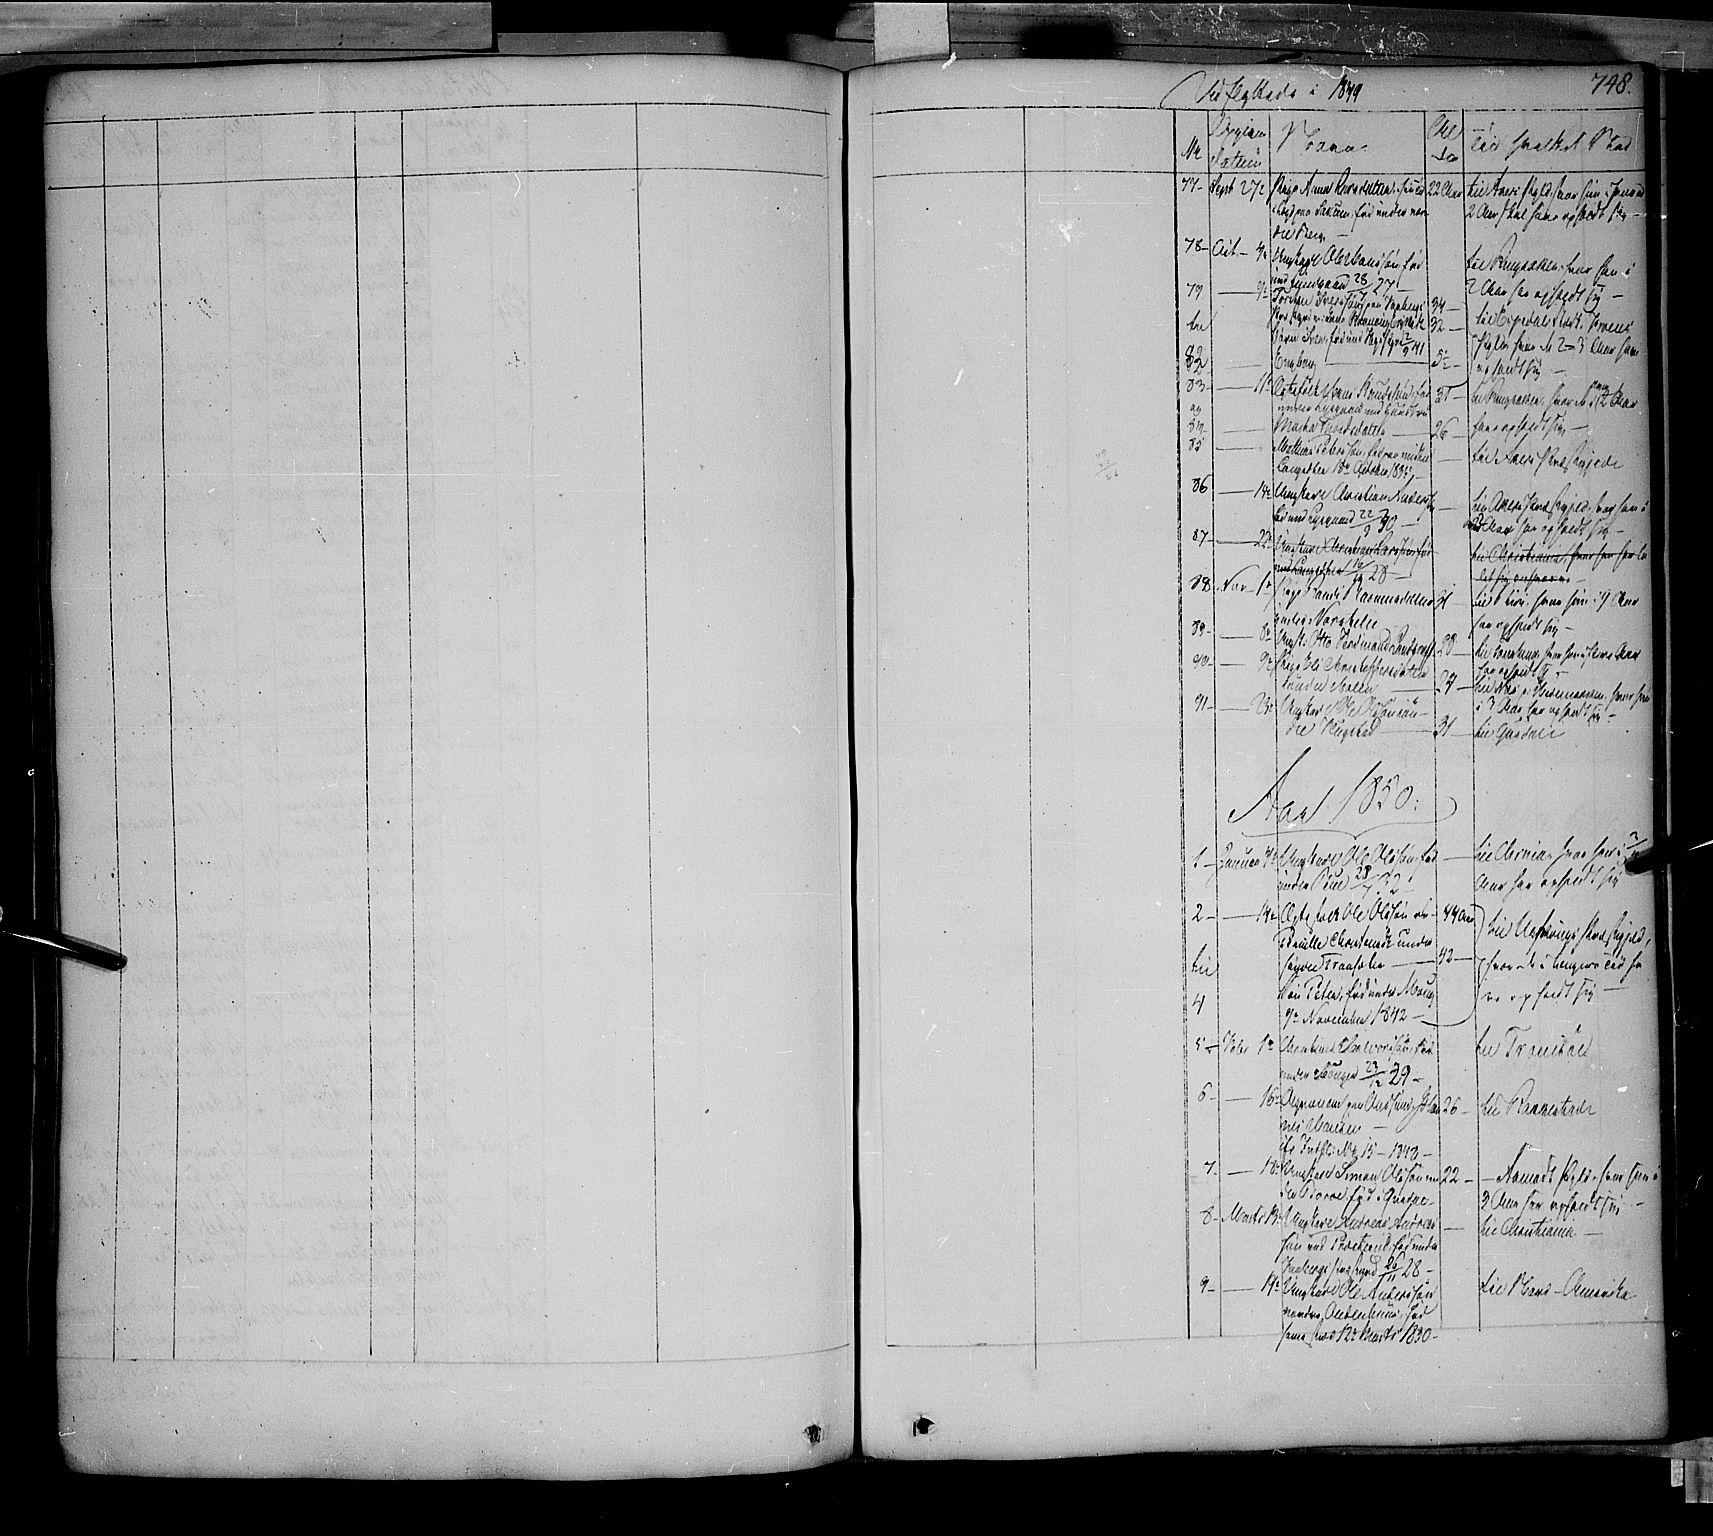 SAH, Fåberg prestekontor, Ministerialbok nr. 5, 1836-1854, s. 747-748